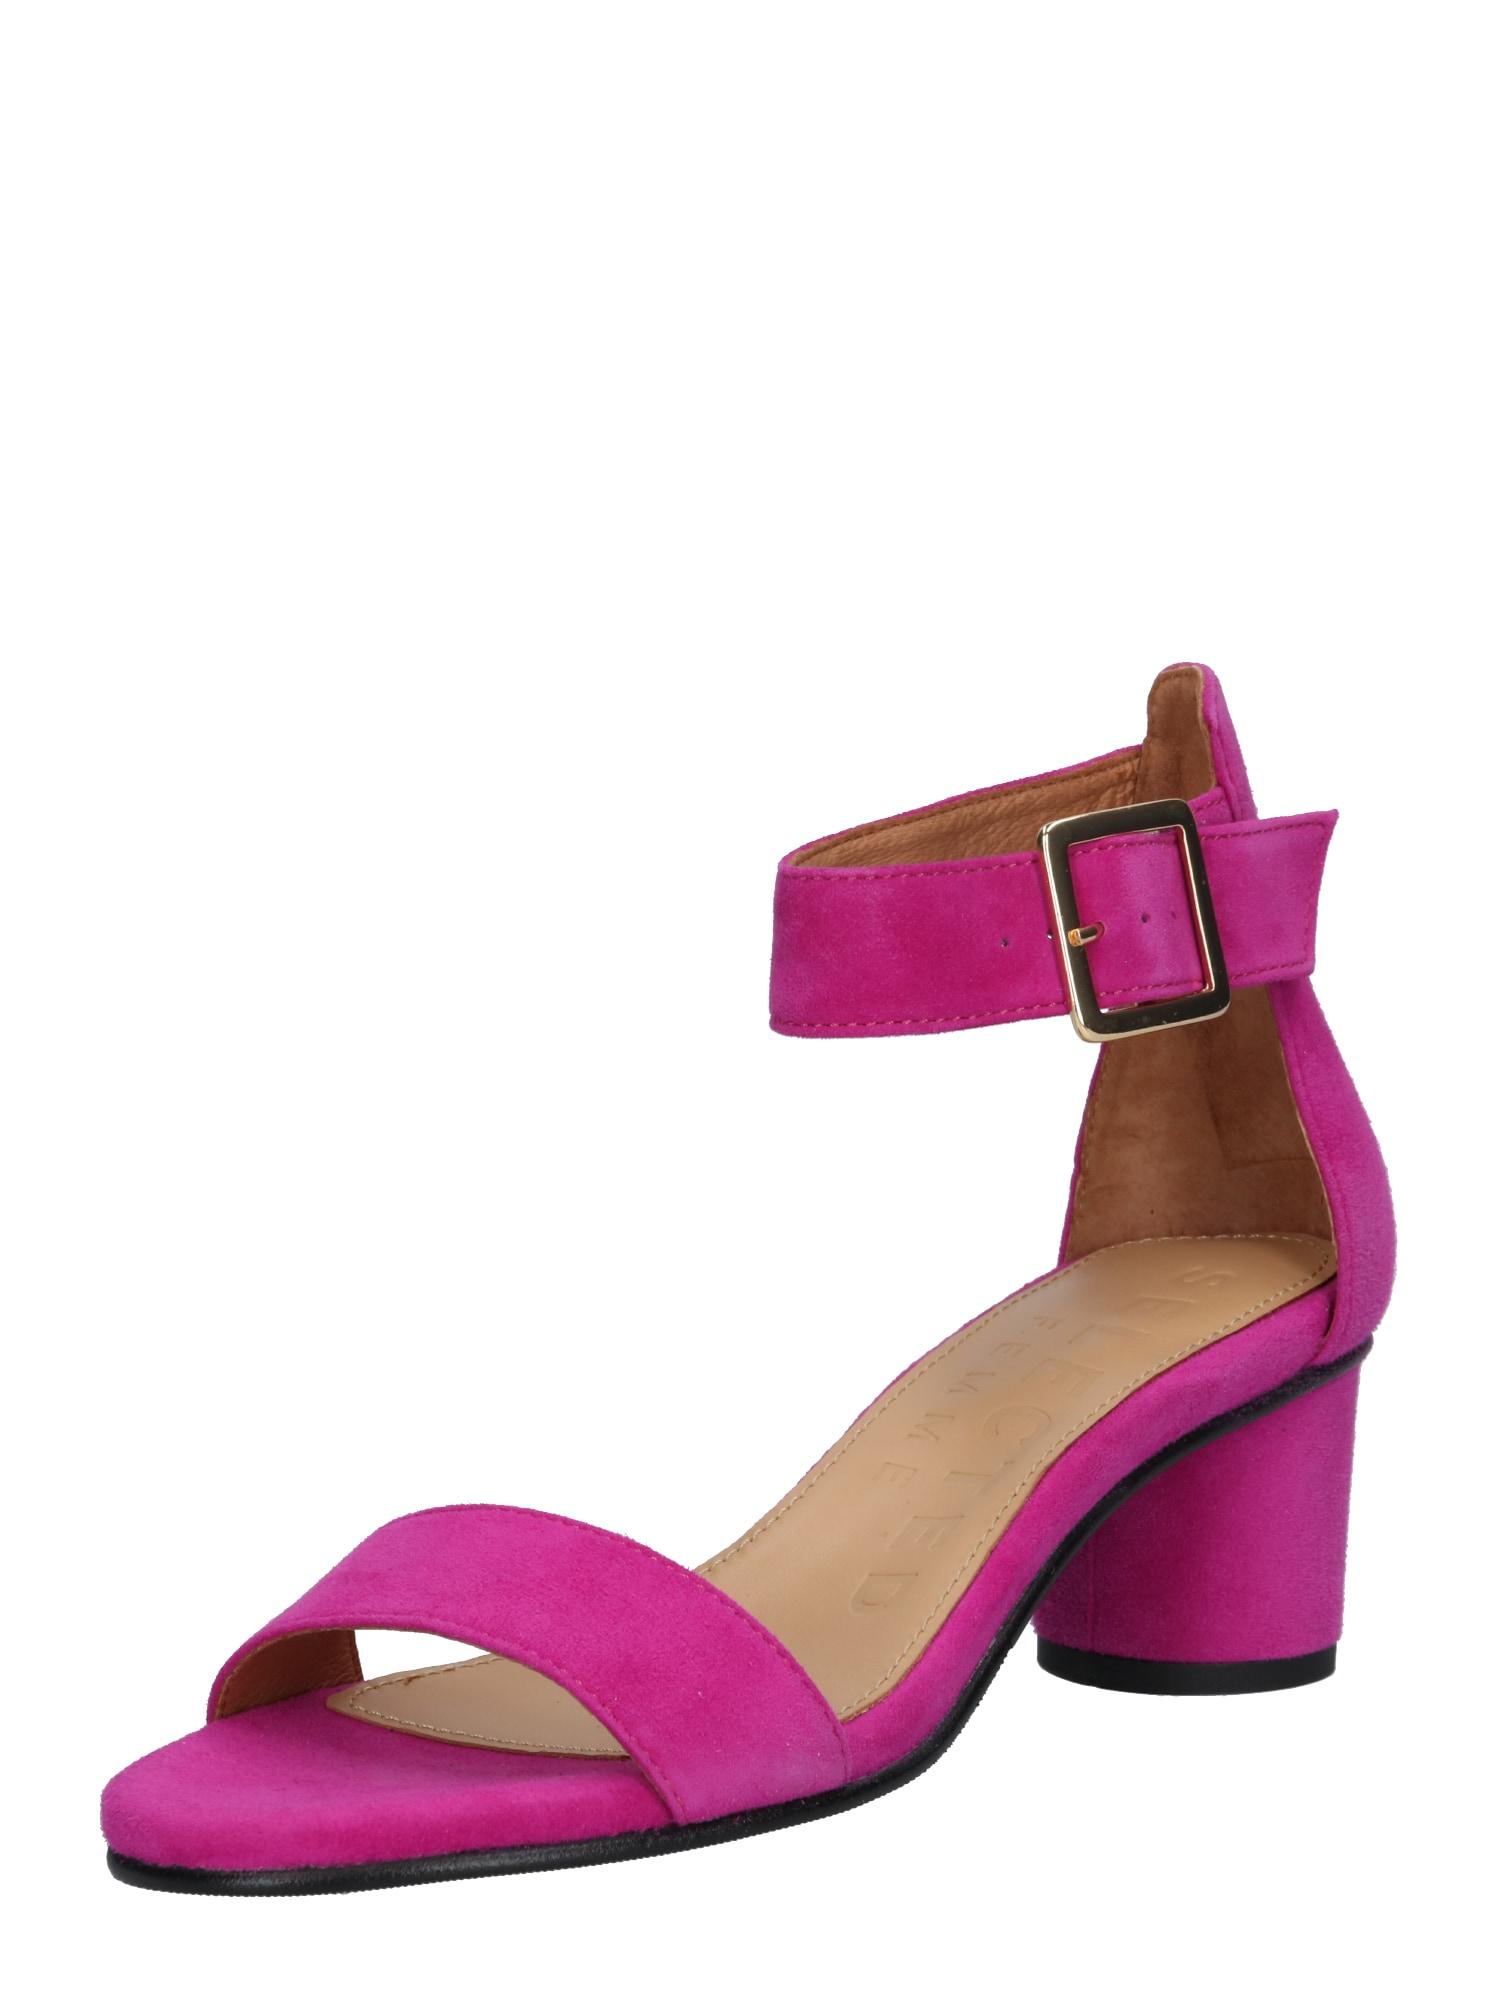 Páskové sandály Merle pink SELECTED FEMME